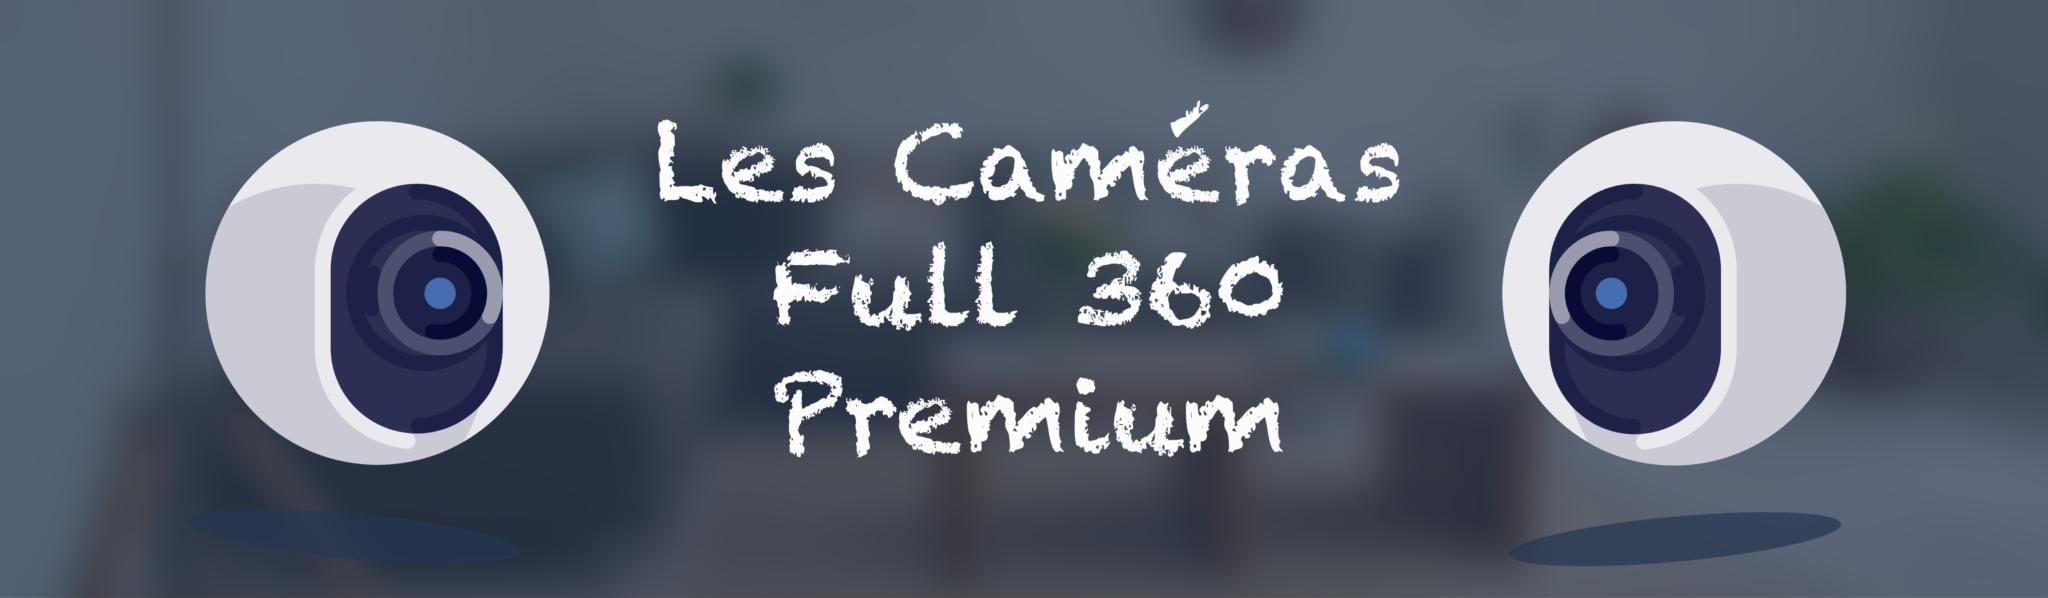 Caméras Full 360 Premium - Immobilier - Meilleure Visite